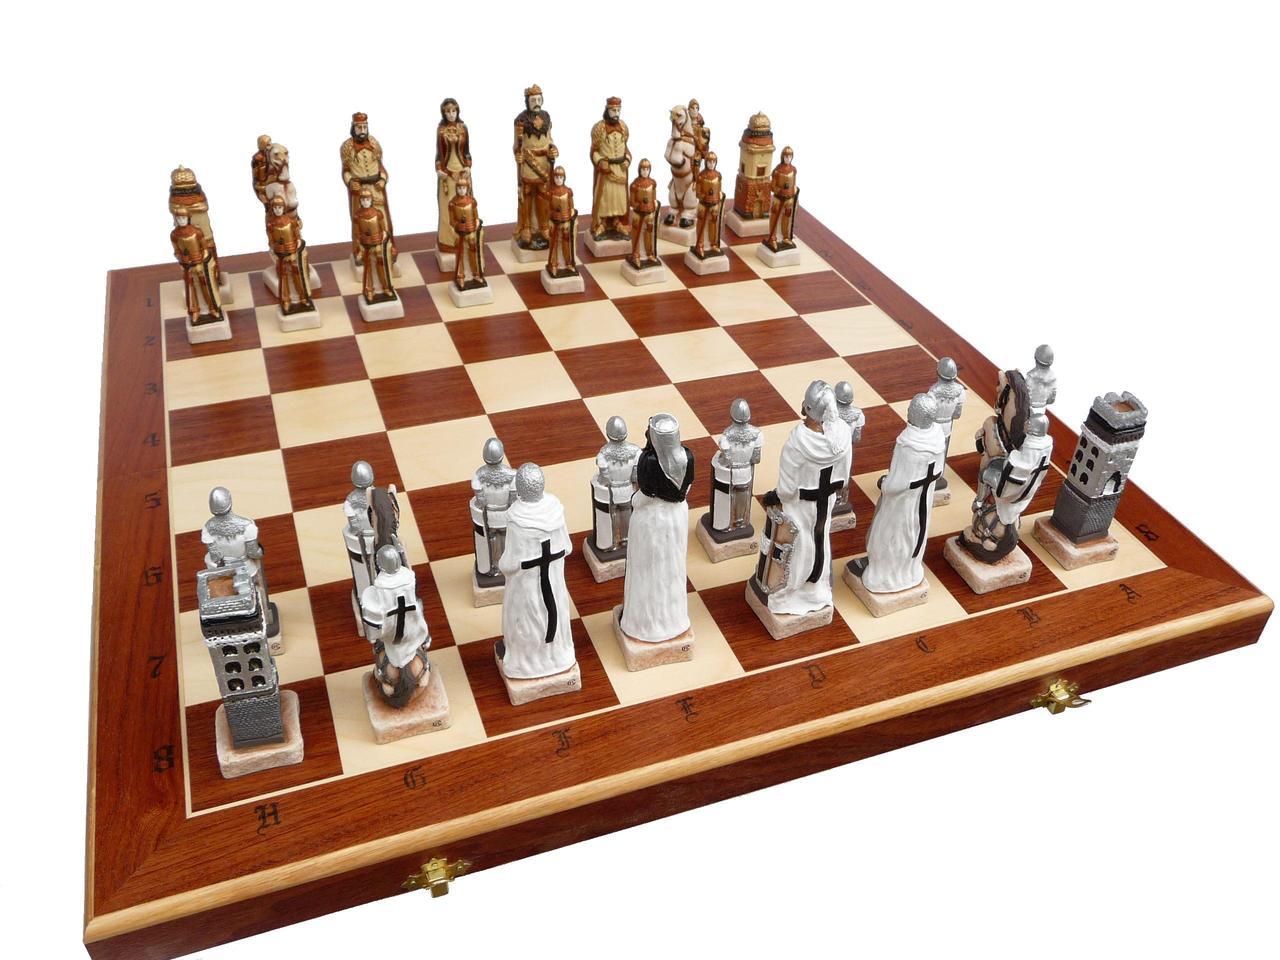 Шахматы Madon Grunwald интарсия 58.5х58.5 см (с-160)